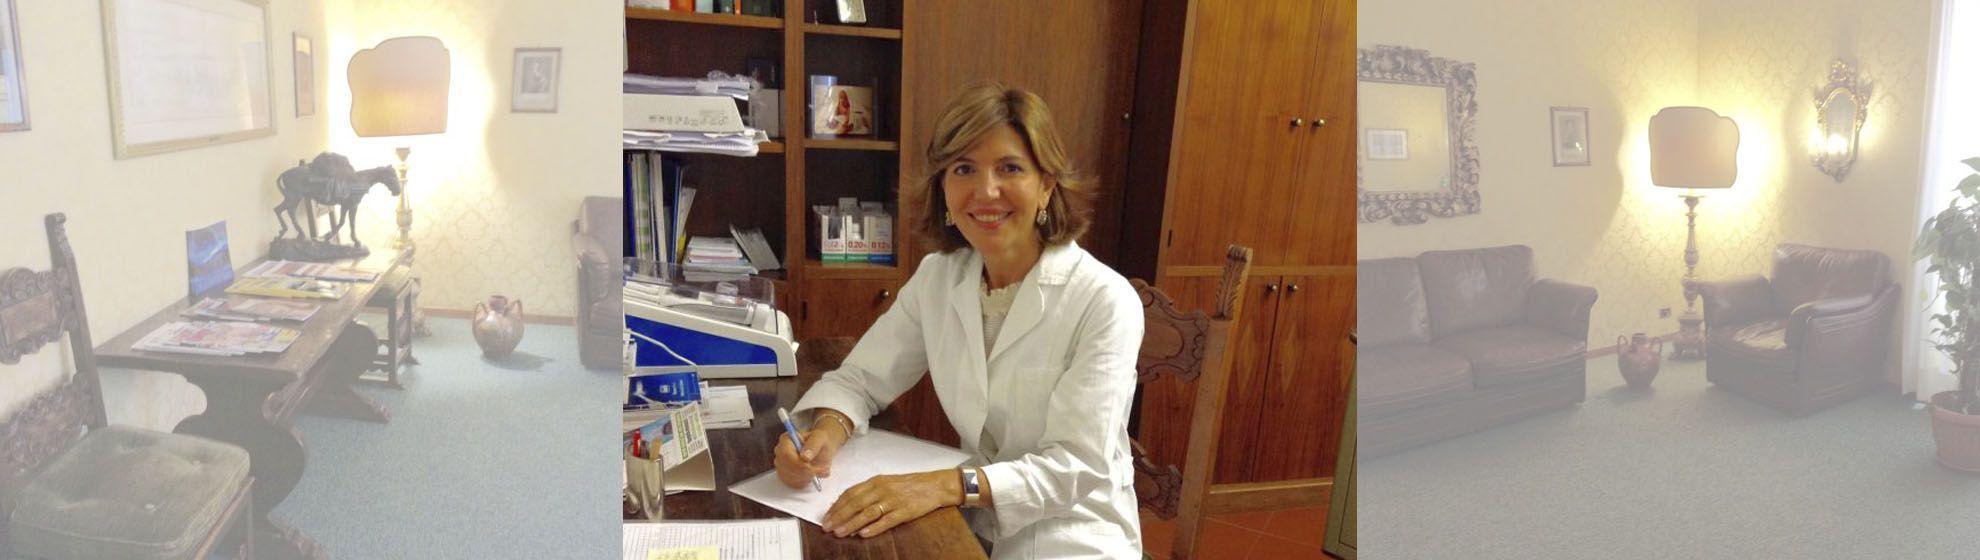 Dott.ssa Marina Rizzo